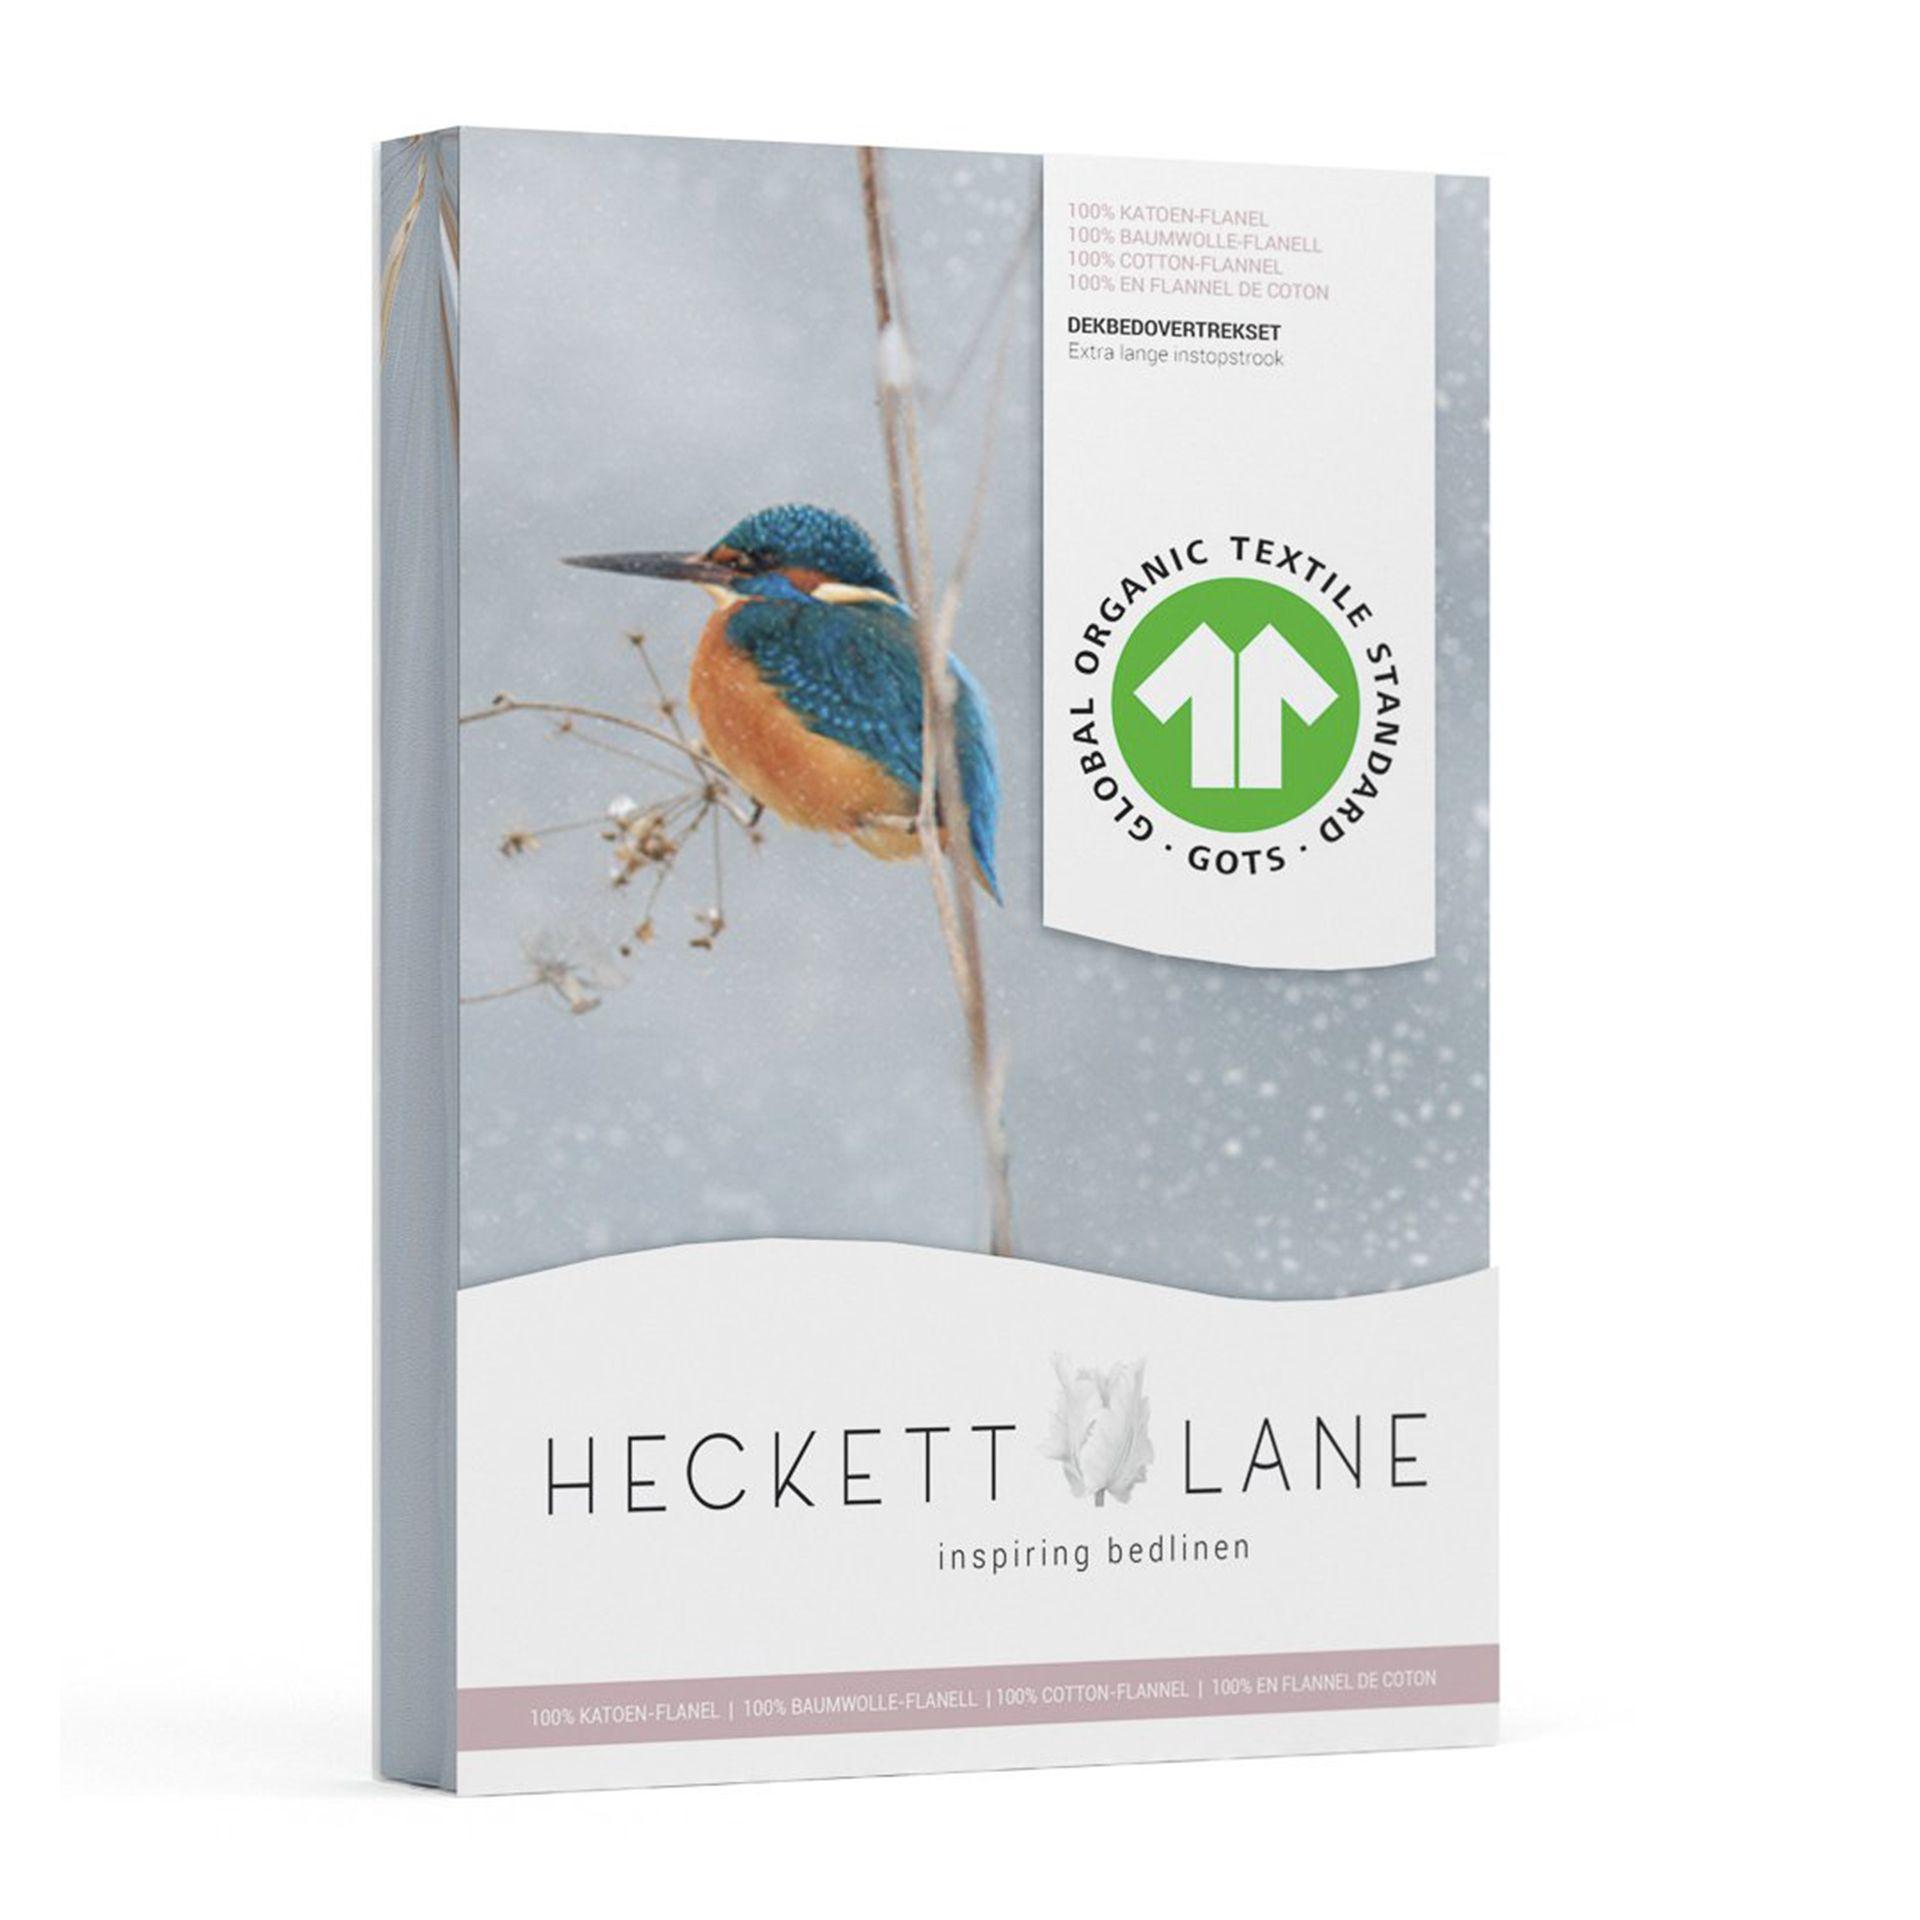 Heckettlane - Cavaller silver grey Dekbedovertrek